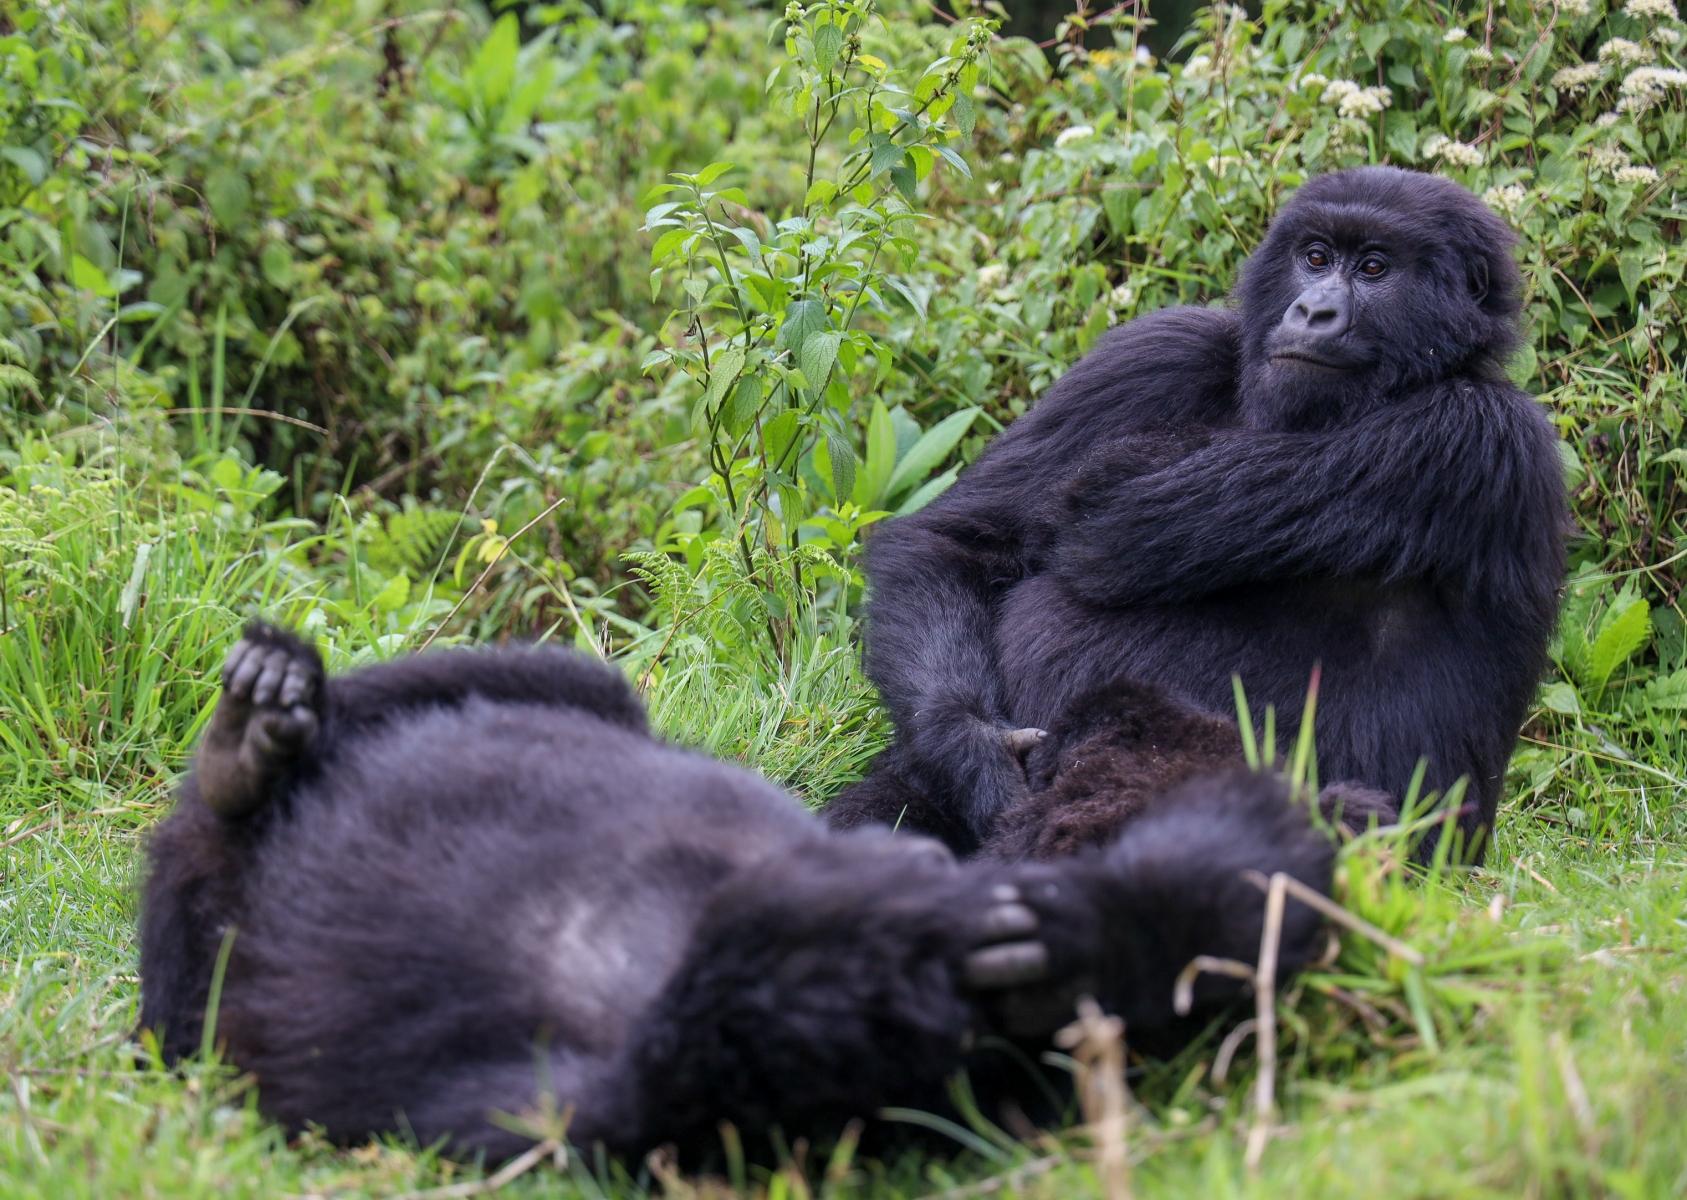 Rwanda-Gorilla-Trekking-Photo-Credit-Kate-Webster-106